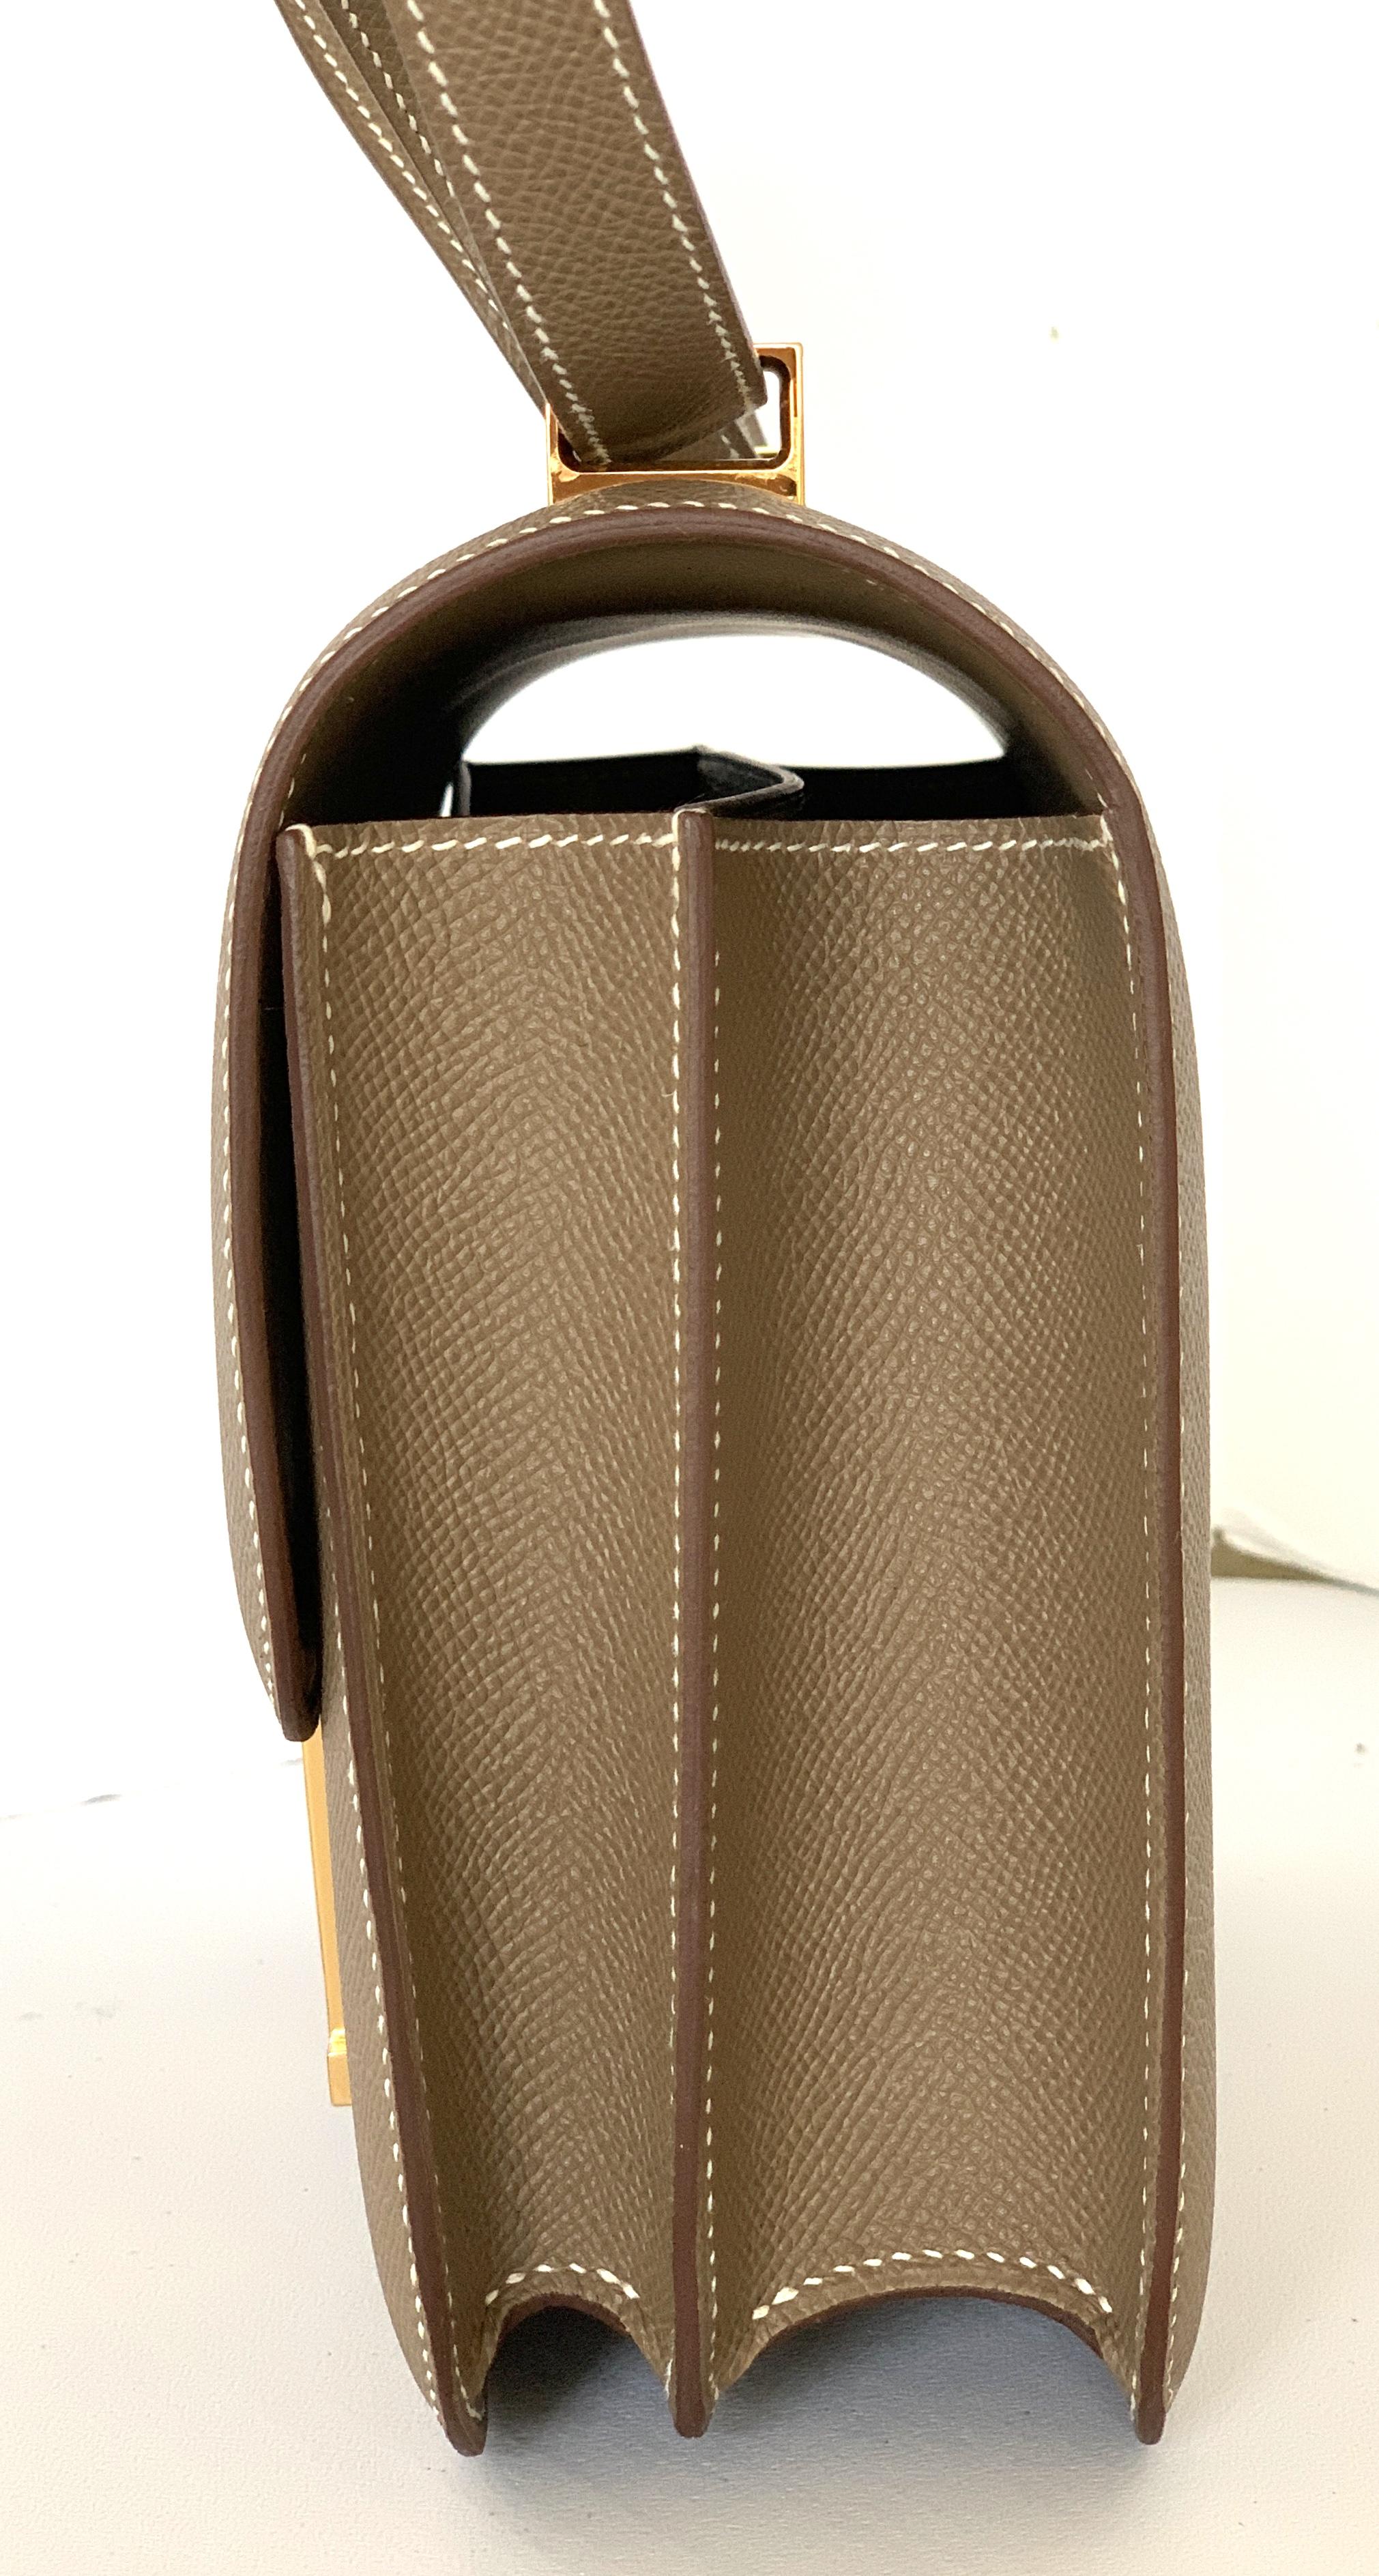 2bd676f6e340 China Constance Bag 24cm Etoupe Epsom Gold Hardware Mesa